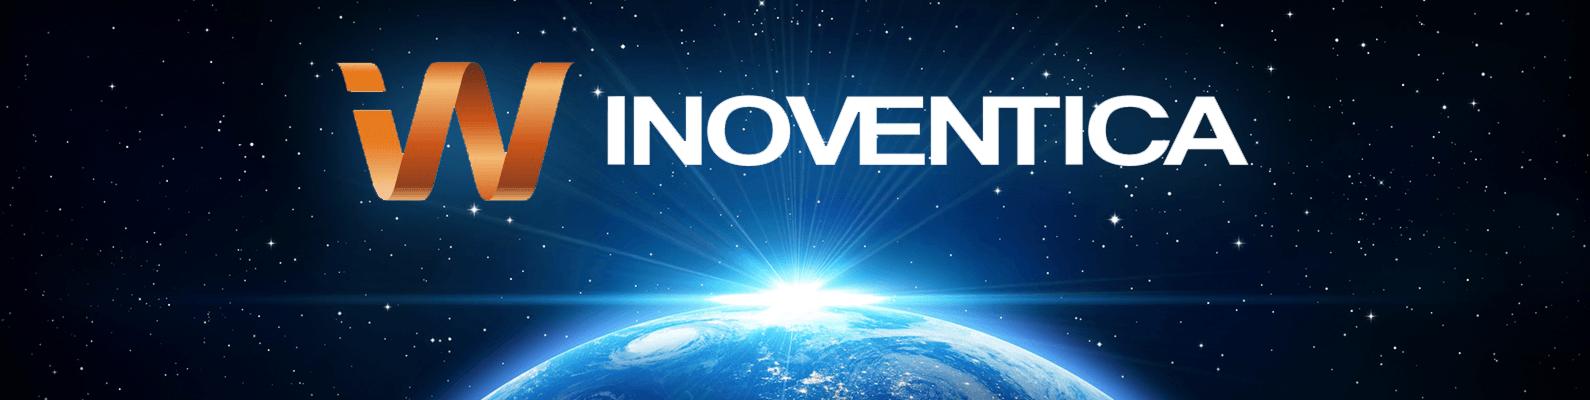 Inoventica Technology